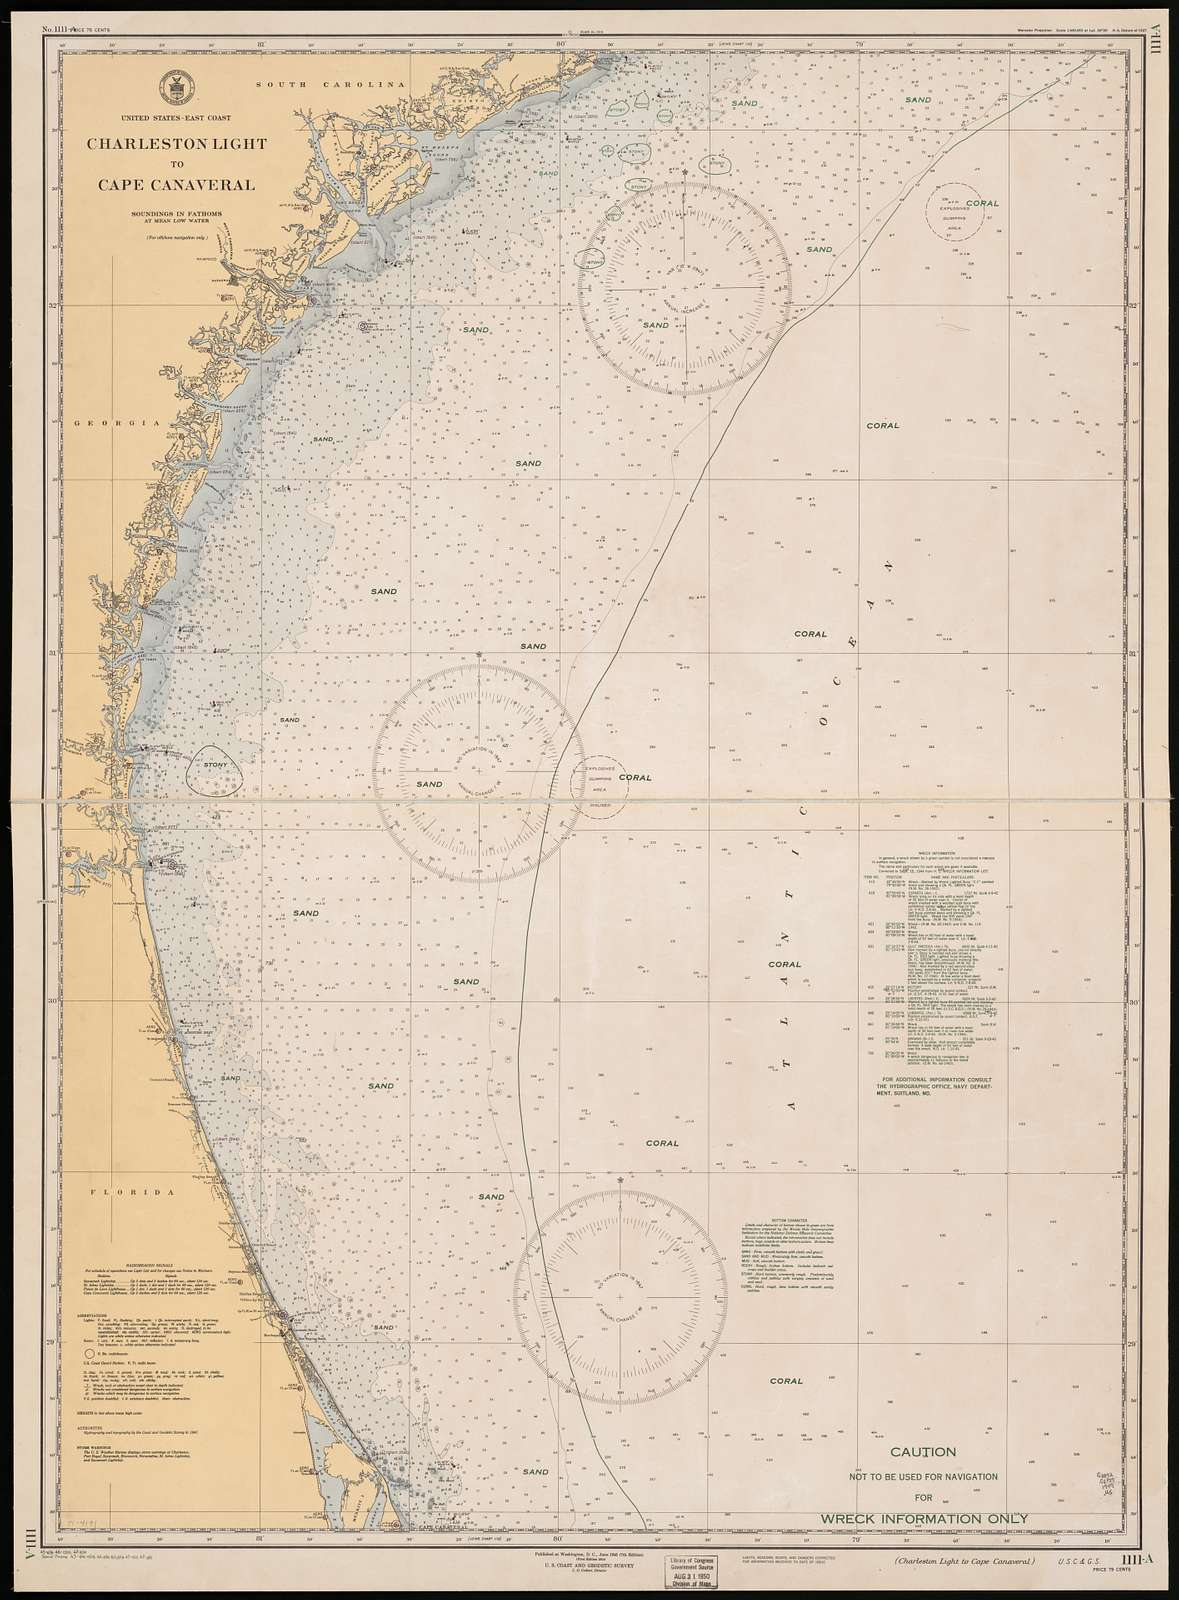 United States, East coast: Charleston Light to Cape Canaveral